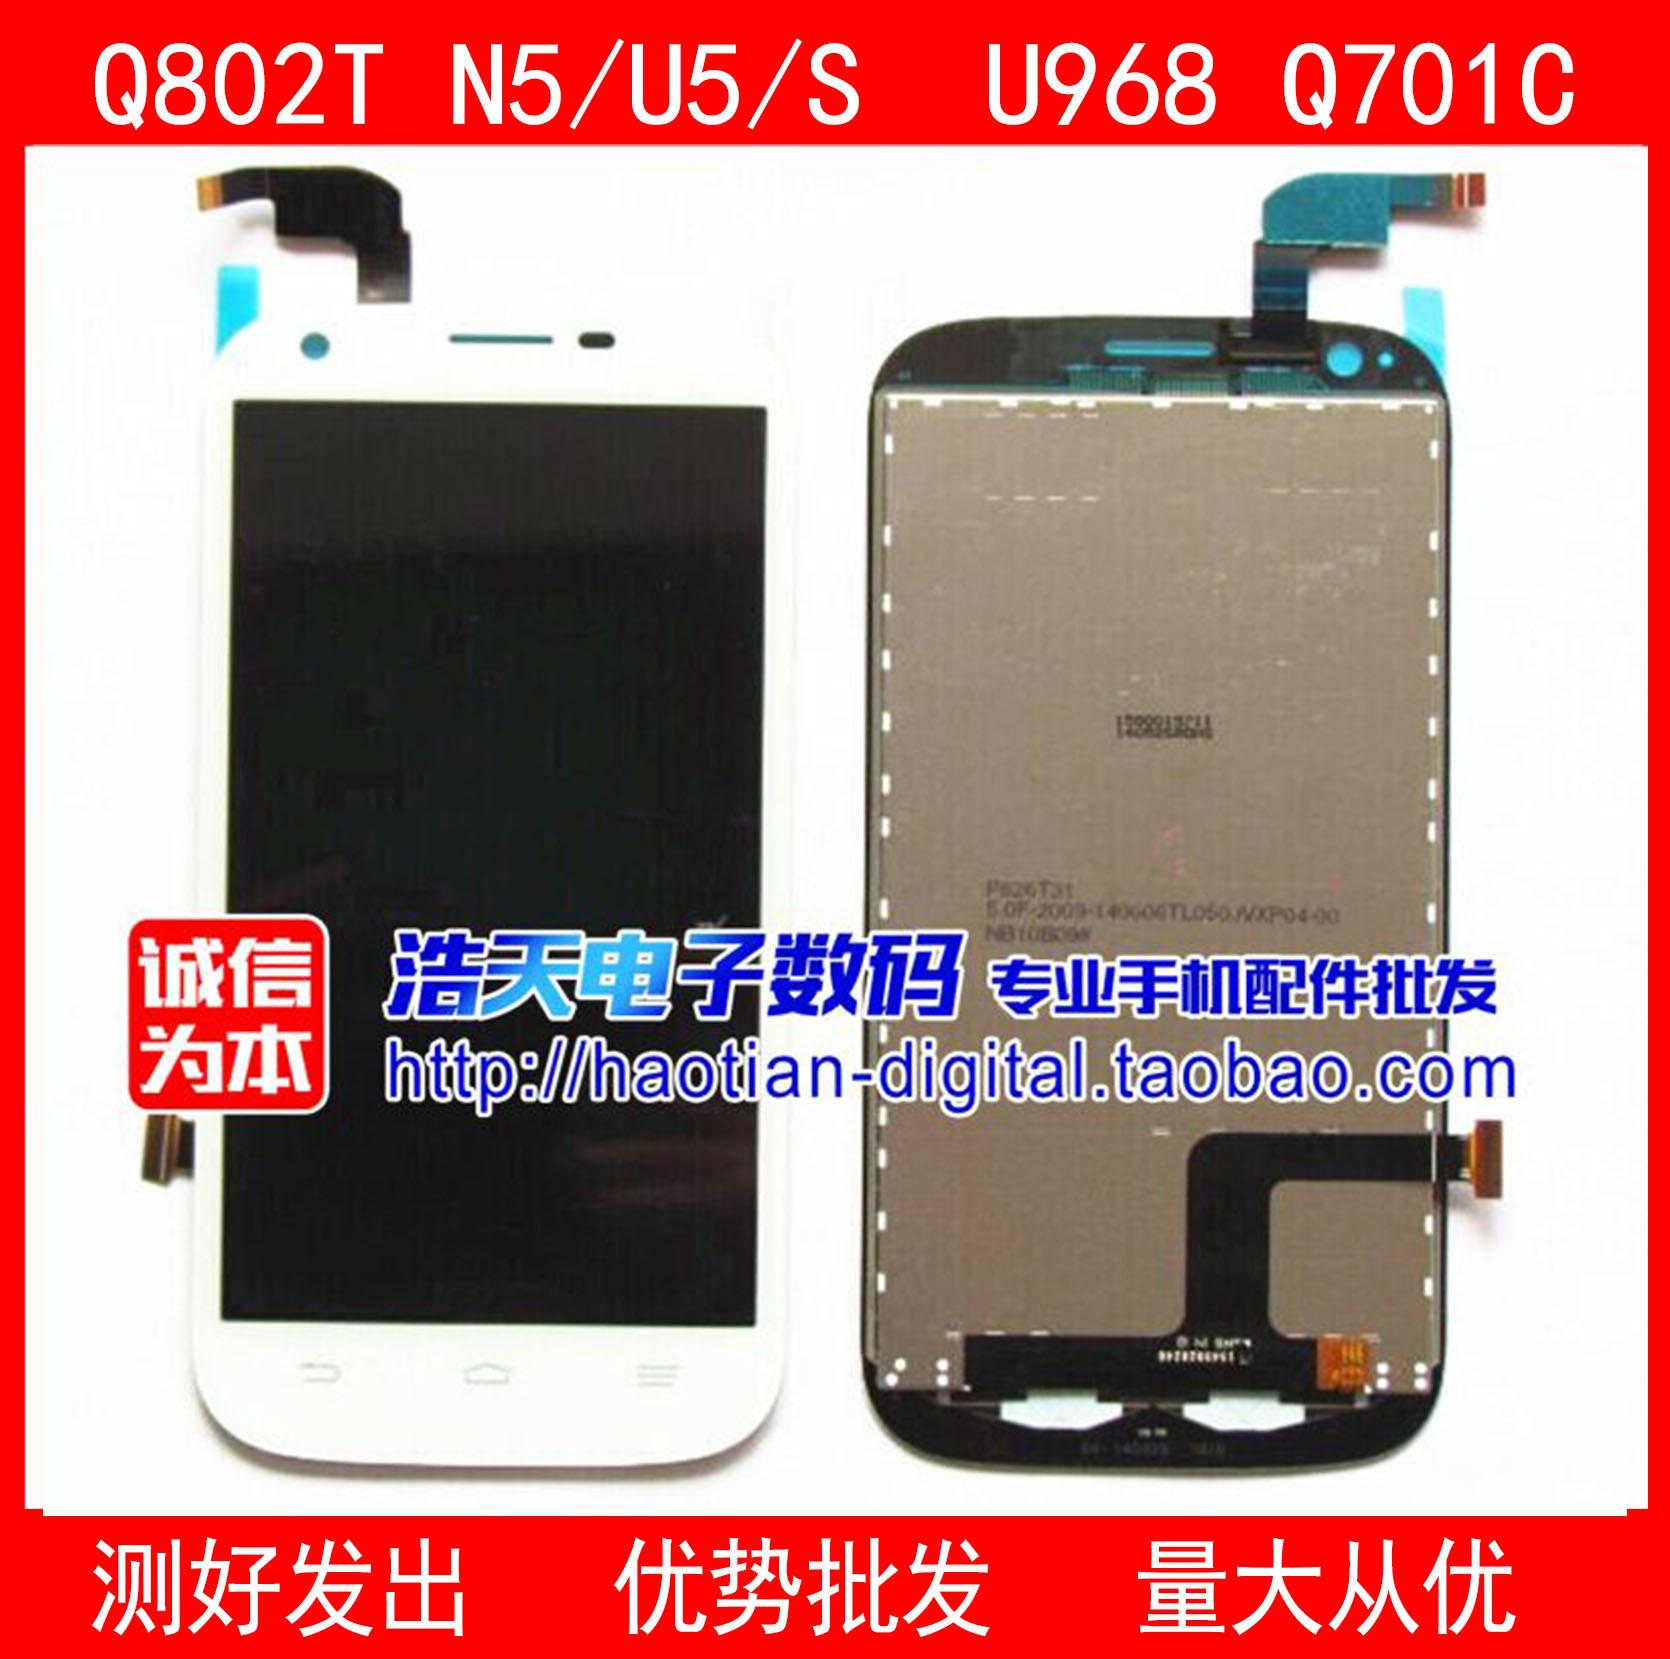 HT适用U9815中兴Q802T总成Q701C触摸屏U968手写屏U879 N5 U5S V5S